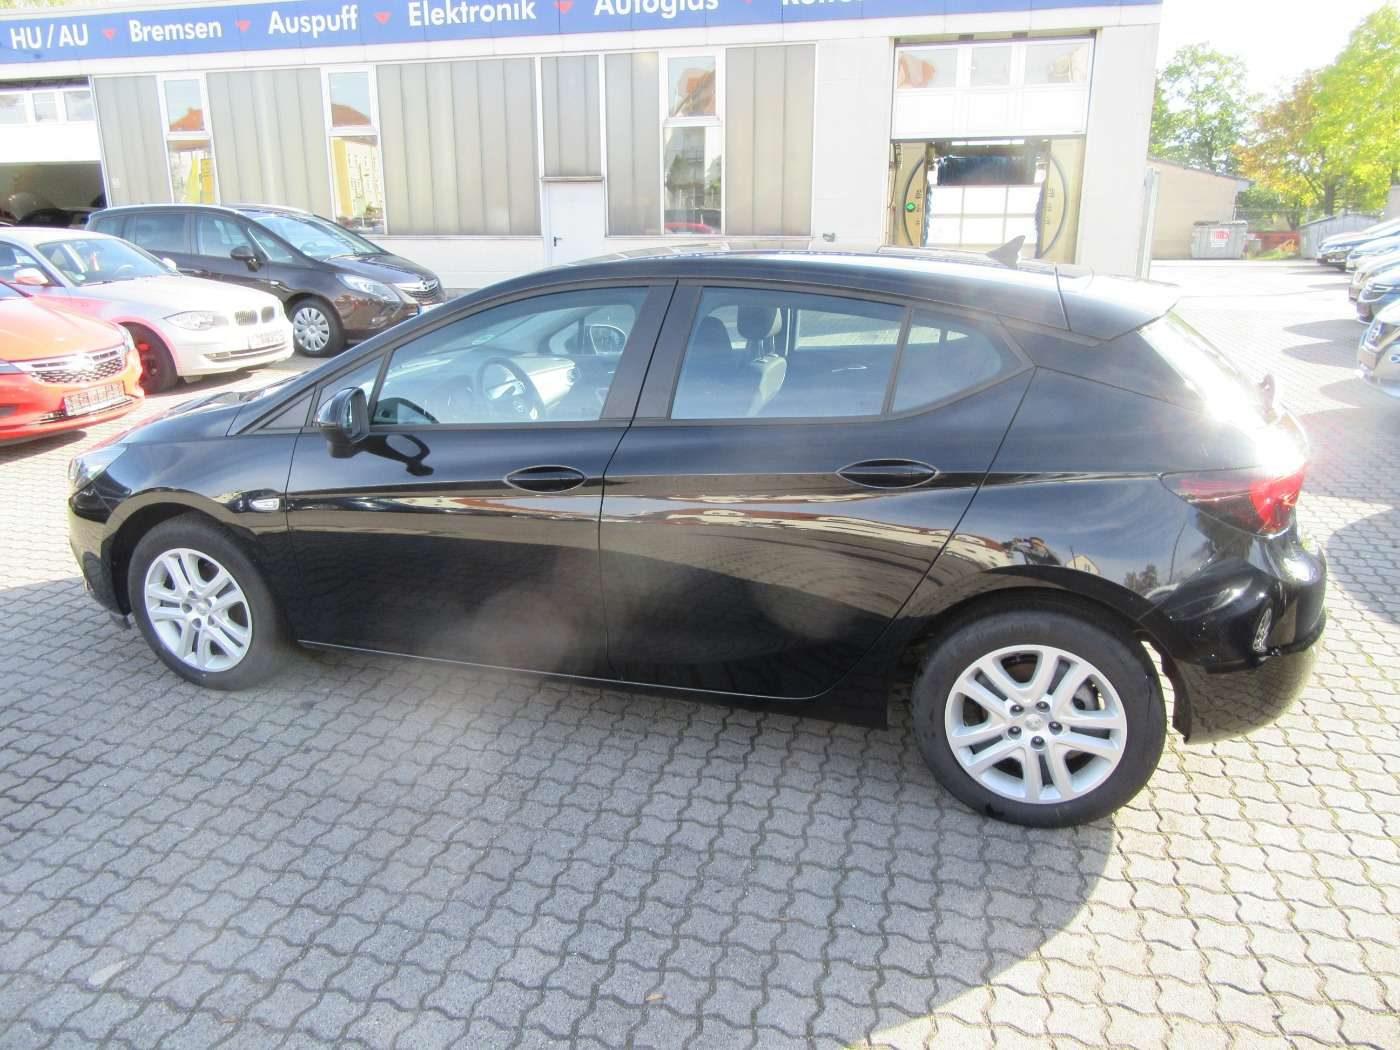 Opel, Astra, K Lim.1.4 Edition Navi,Parkpilot,Bluetooth